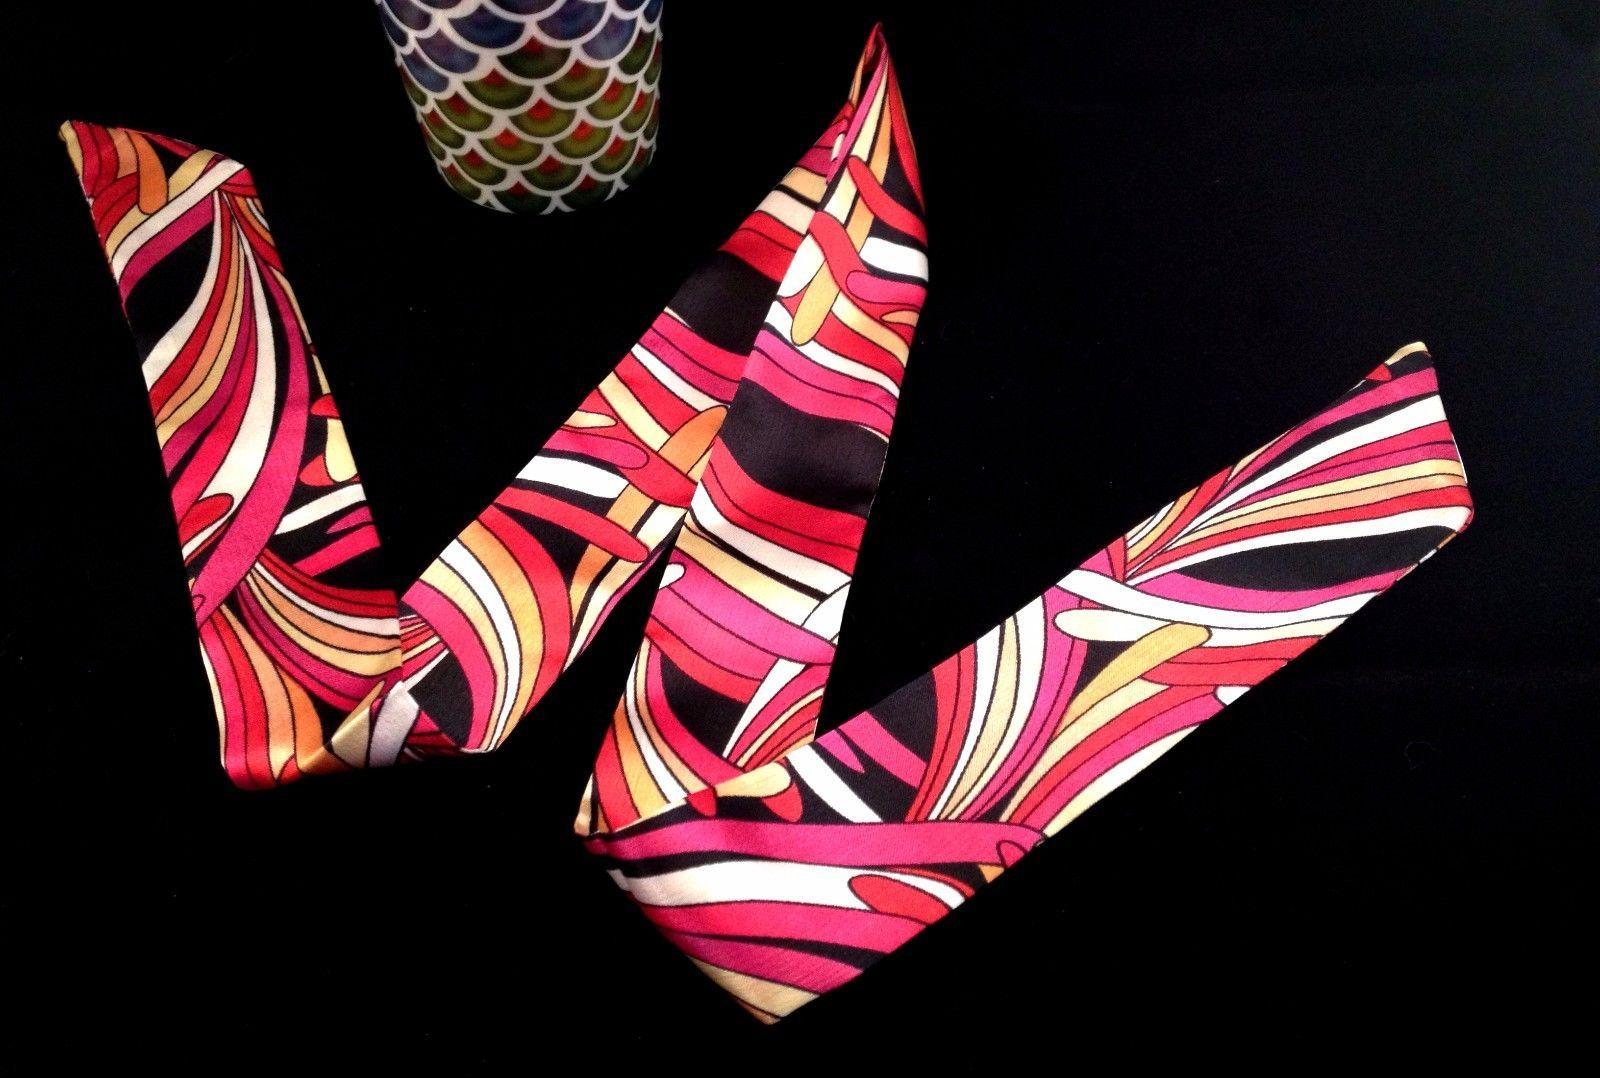 St. Germain Twilly Scarf Pink Abstract Swirl Purse Handbag Luxury